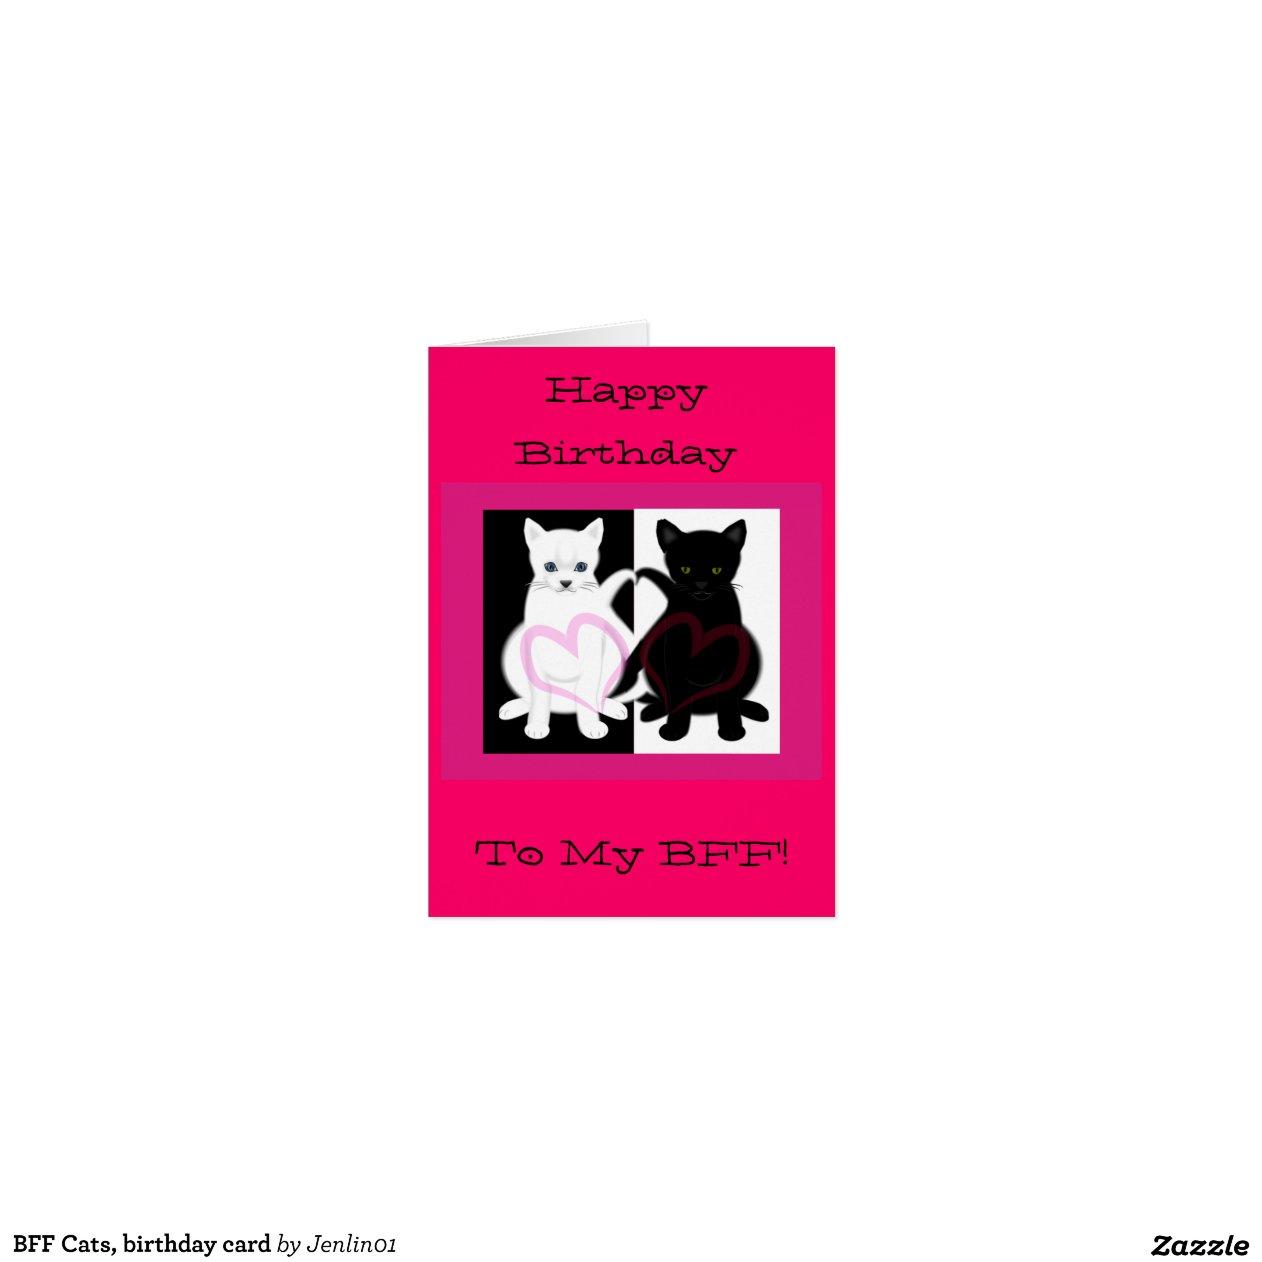 Beste freundin katzen geburtstagskarte gru karte zazzle - Weihnachtsgeschenkideen fa r beste freundin ...